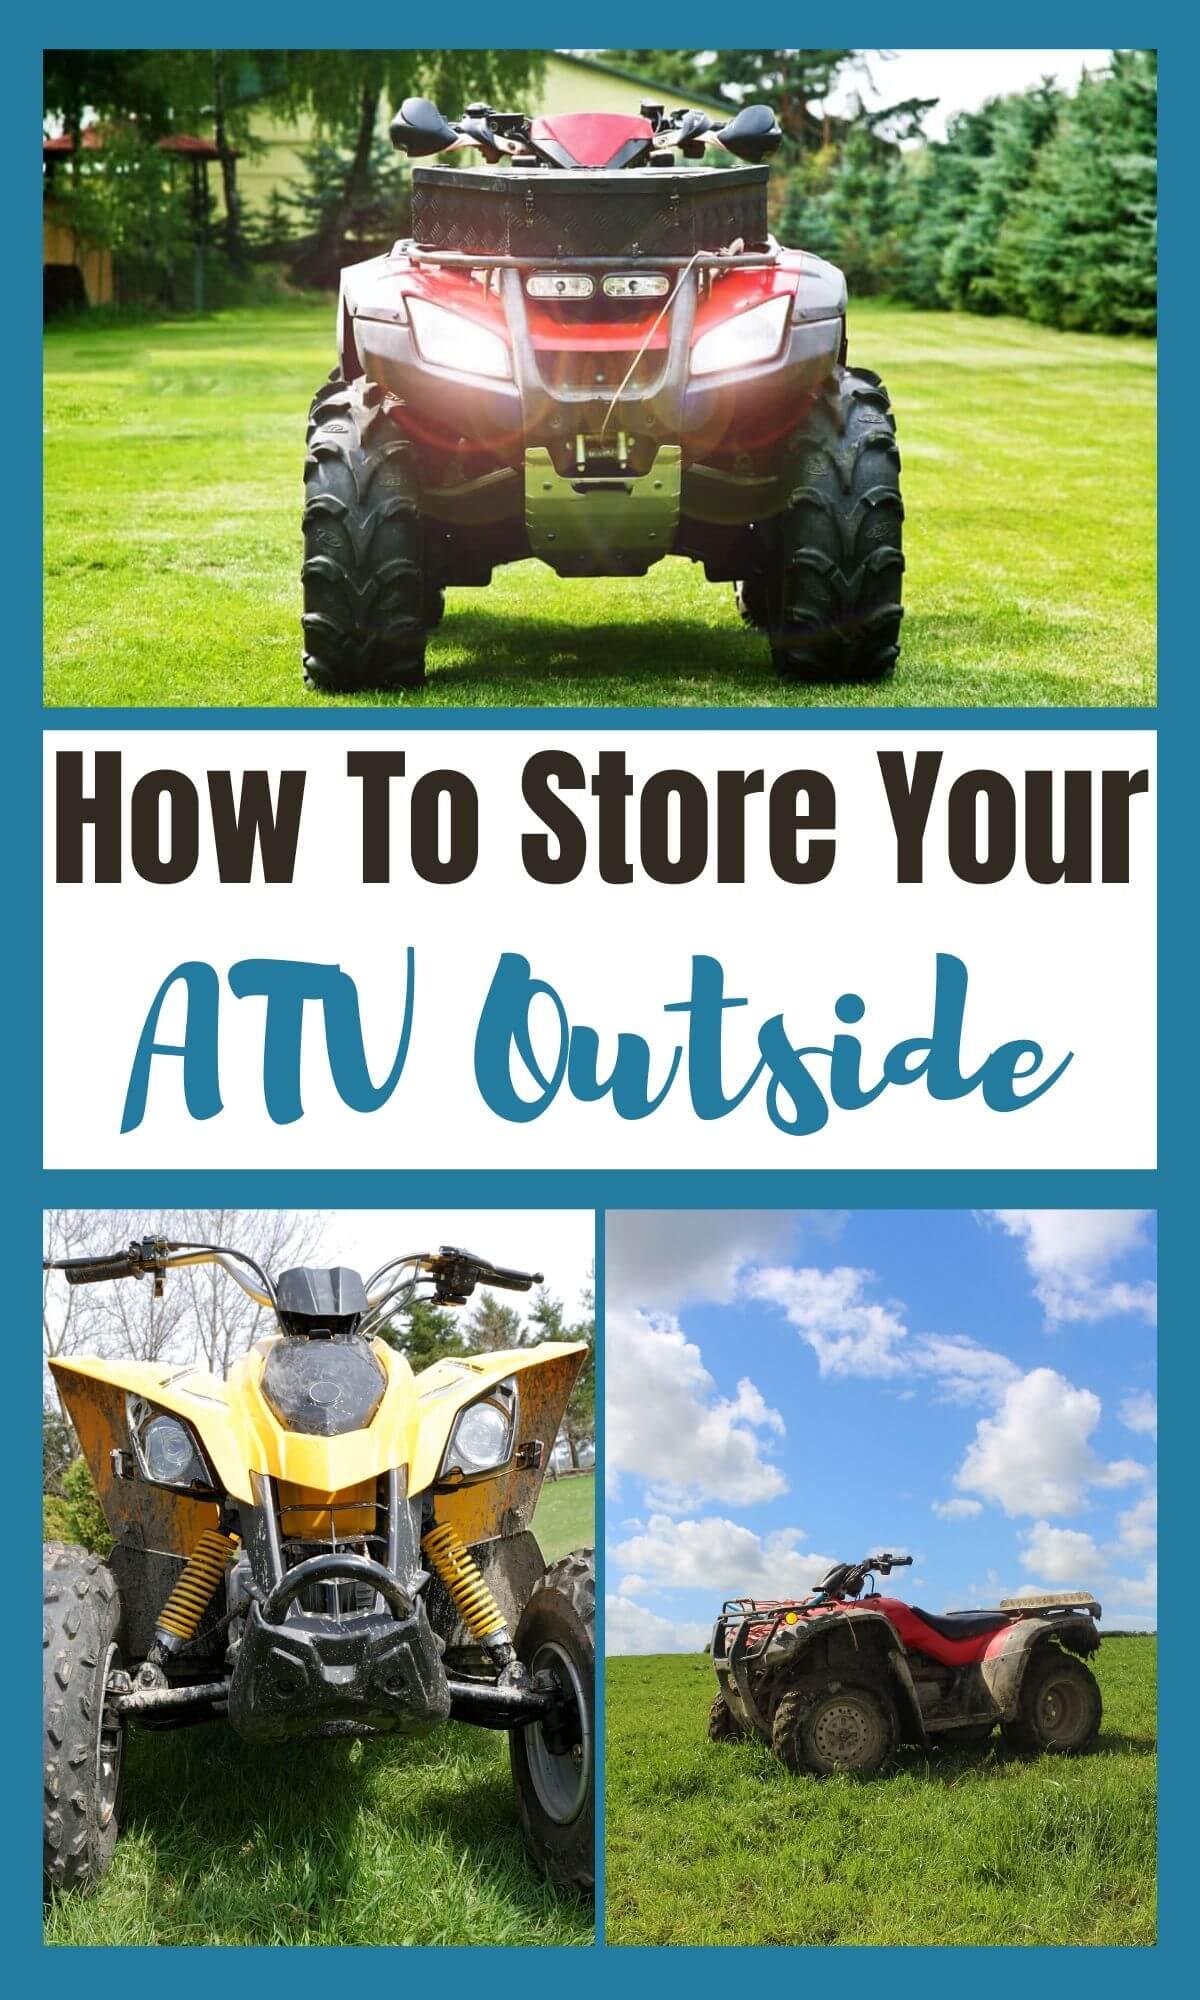 storing your atv outside